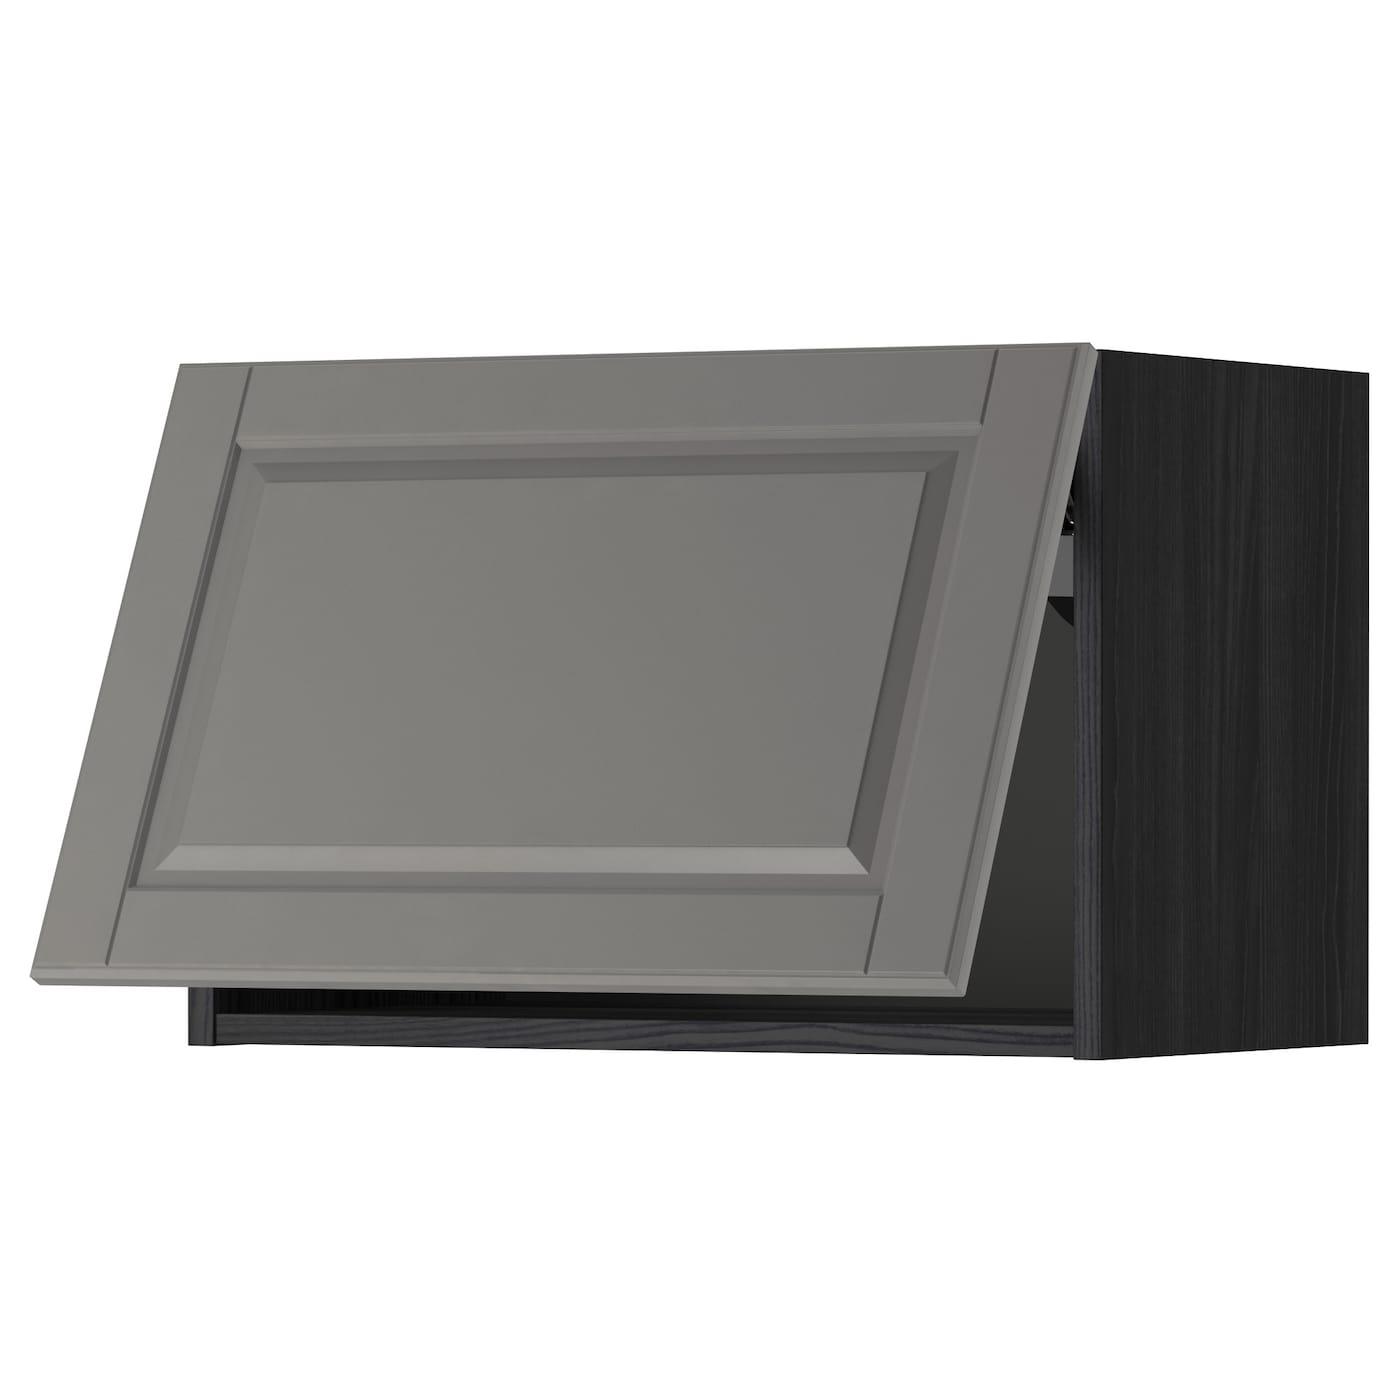 METOD Wall Cabinet Horizontal Black/bodbyn Grey 60 X 40 Cm